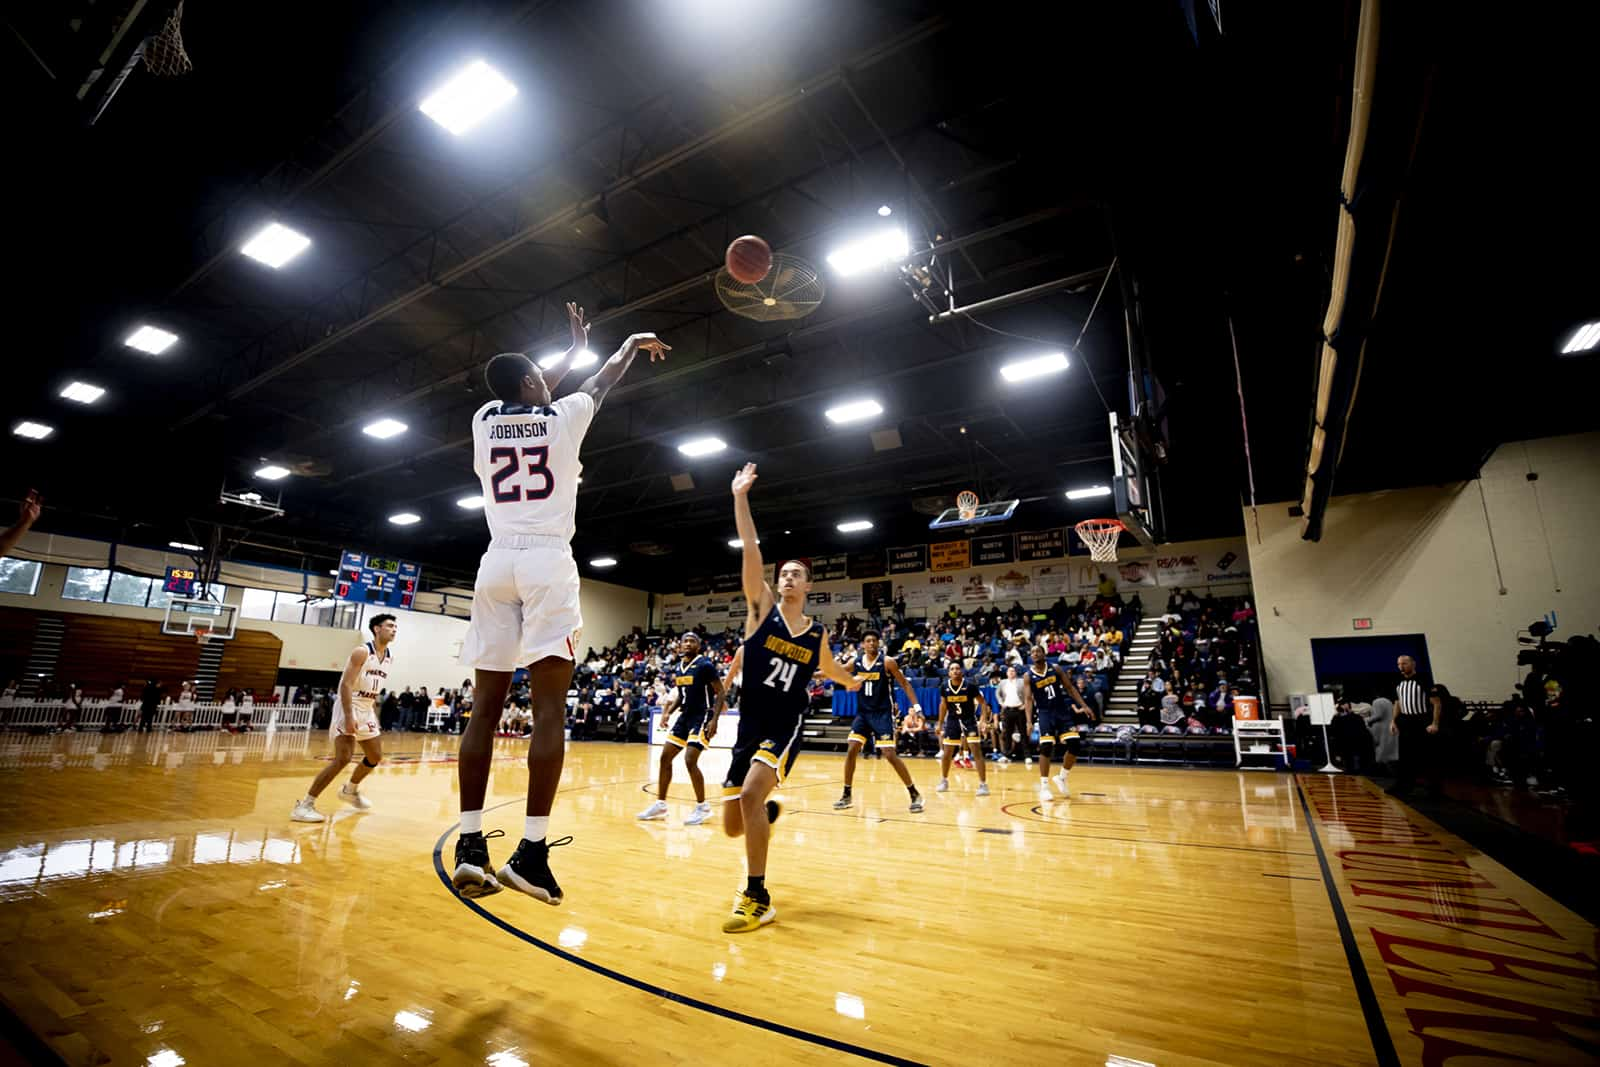 An FMU Patriot makes a shot during a basketball game.